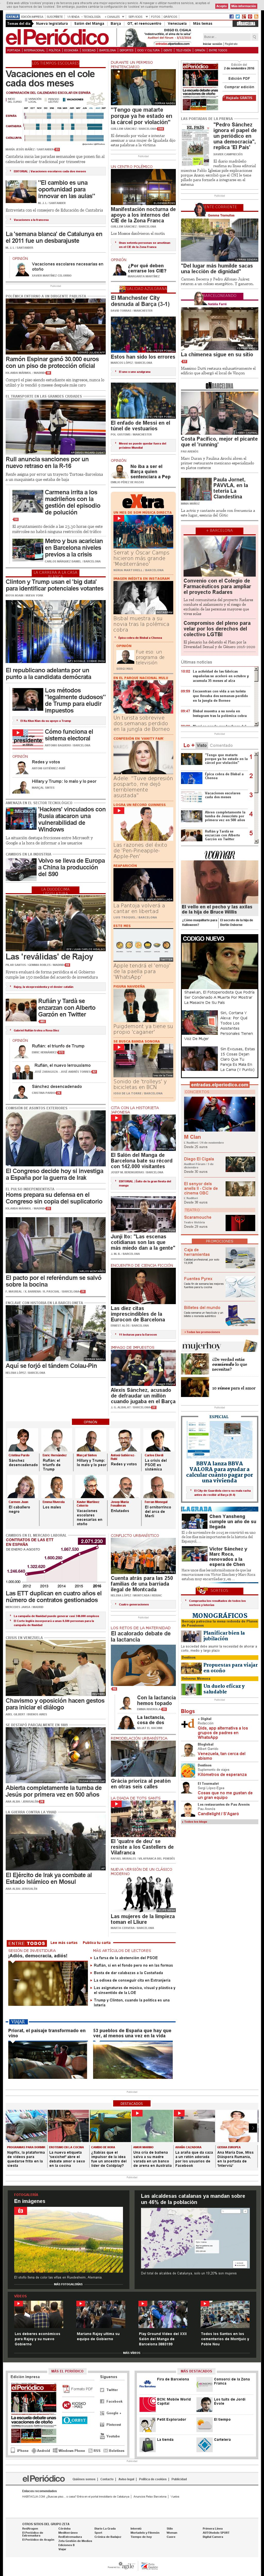 El Periodico at Wednesday Nov. 2, 2016, 9:13 a.m. UTC